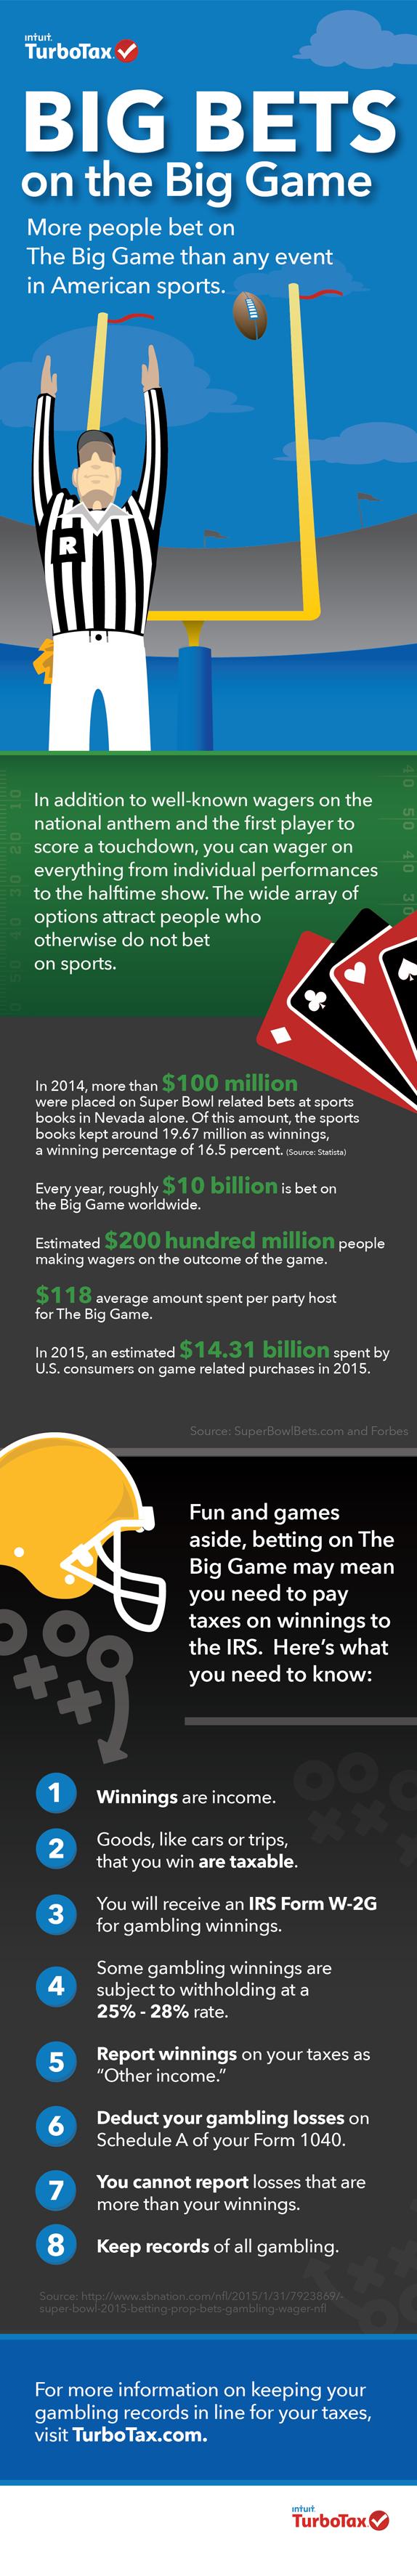 Turbo tax gambling